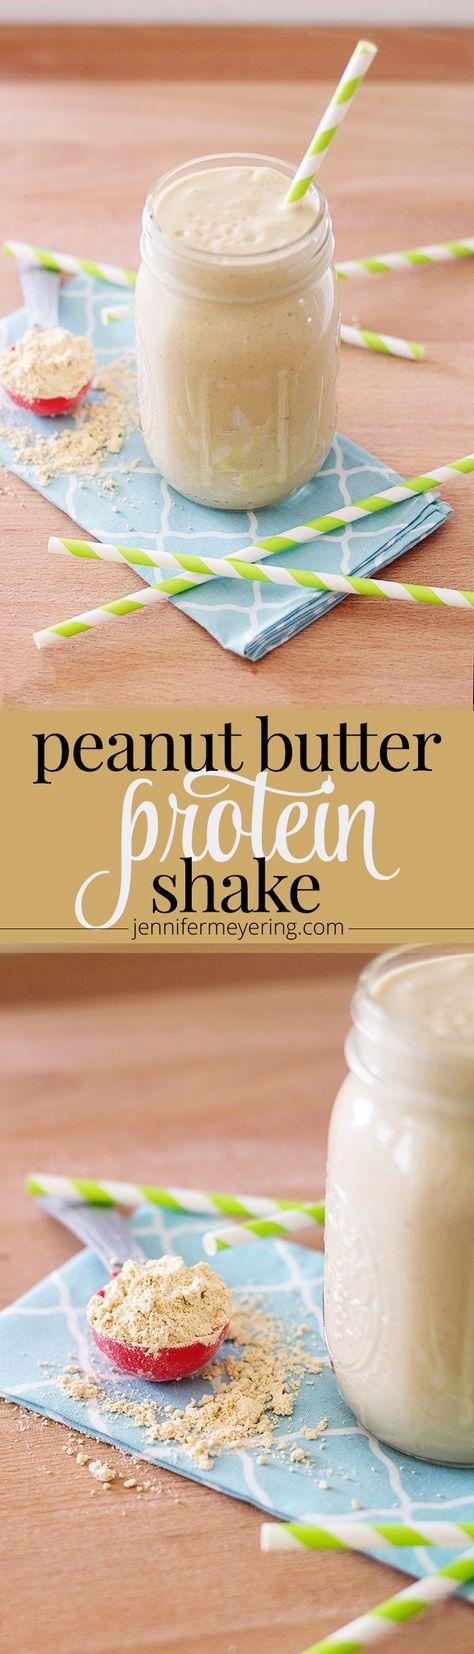 Peanut Butter Protein Smoothie | JenniferMeyering.com